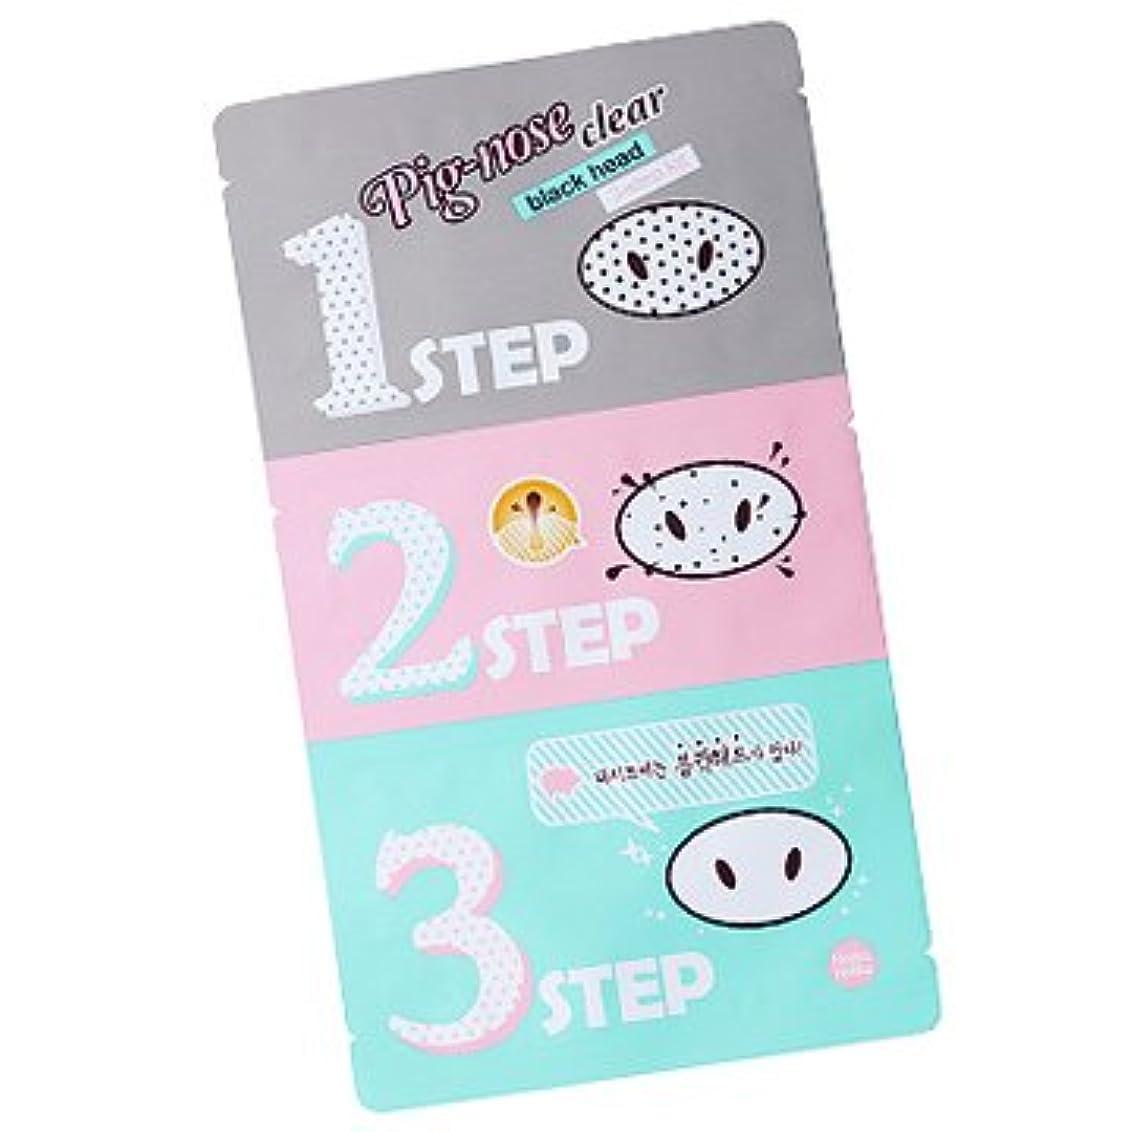 Holika Holika Pig Nose Clear Black Head 3-Step Kit 10EA (Nose Pack) ホリカホリカ ピグノーズクリアブラックヘッド3-Stepキット(鼻パック) 10pcs...